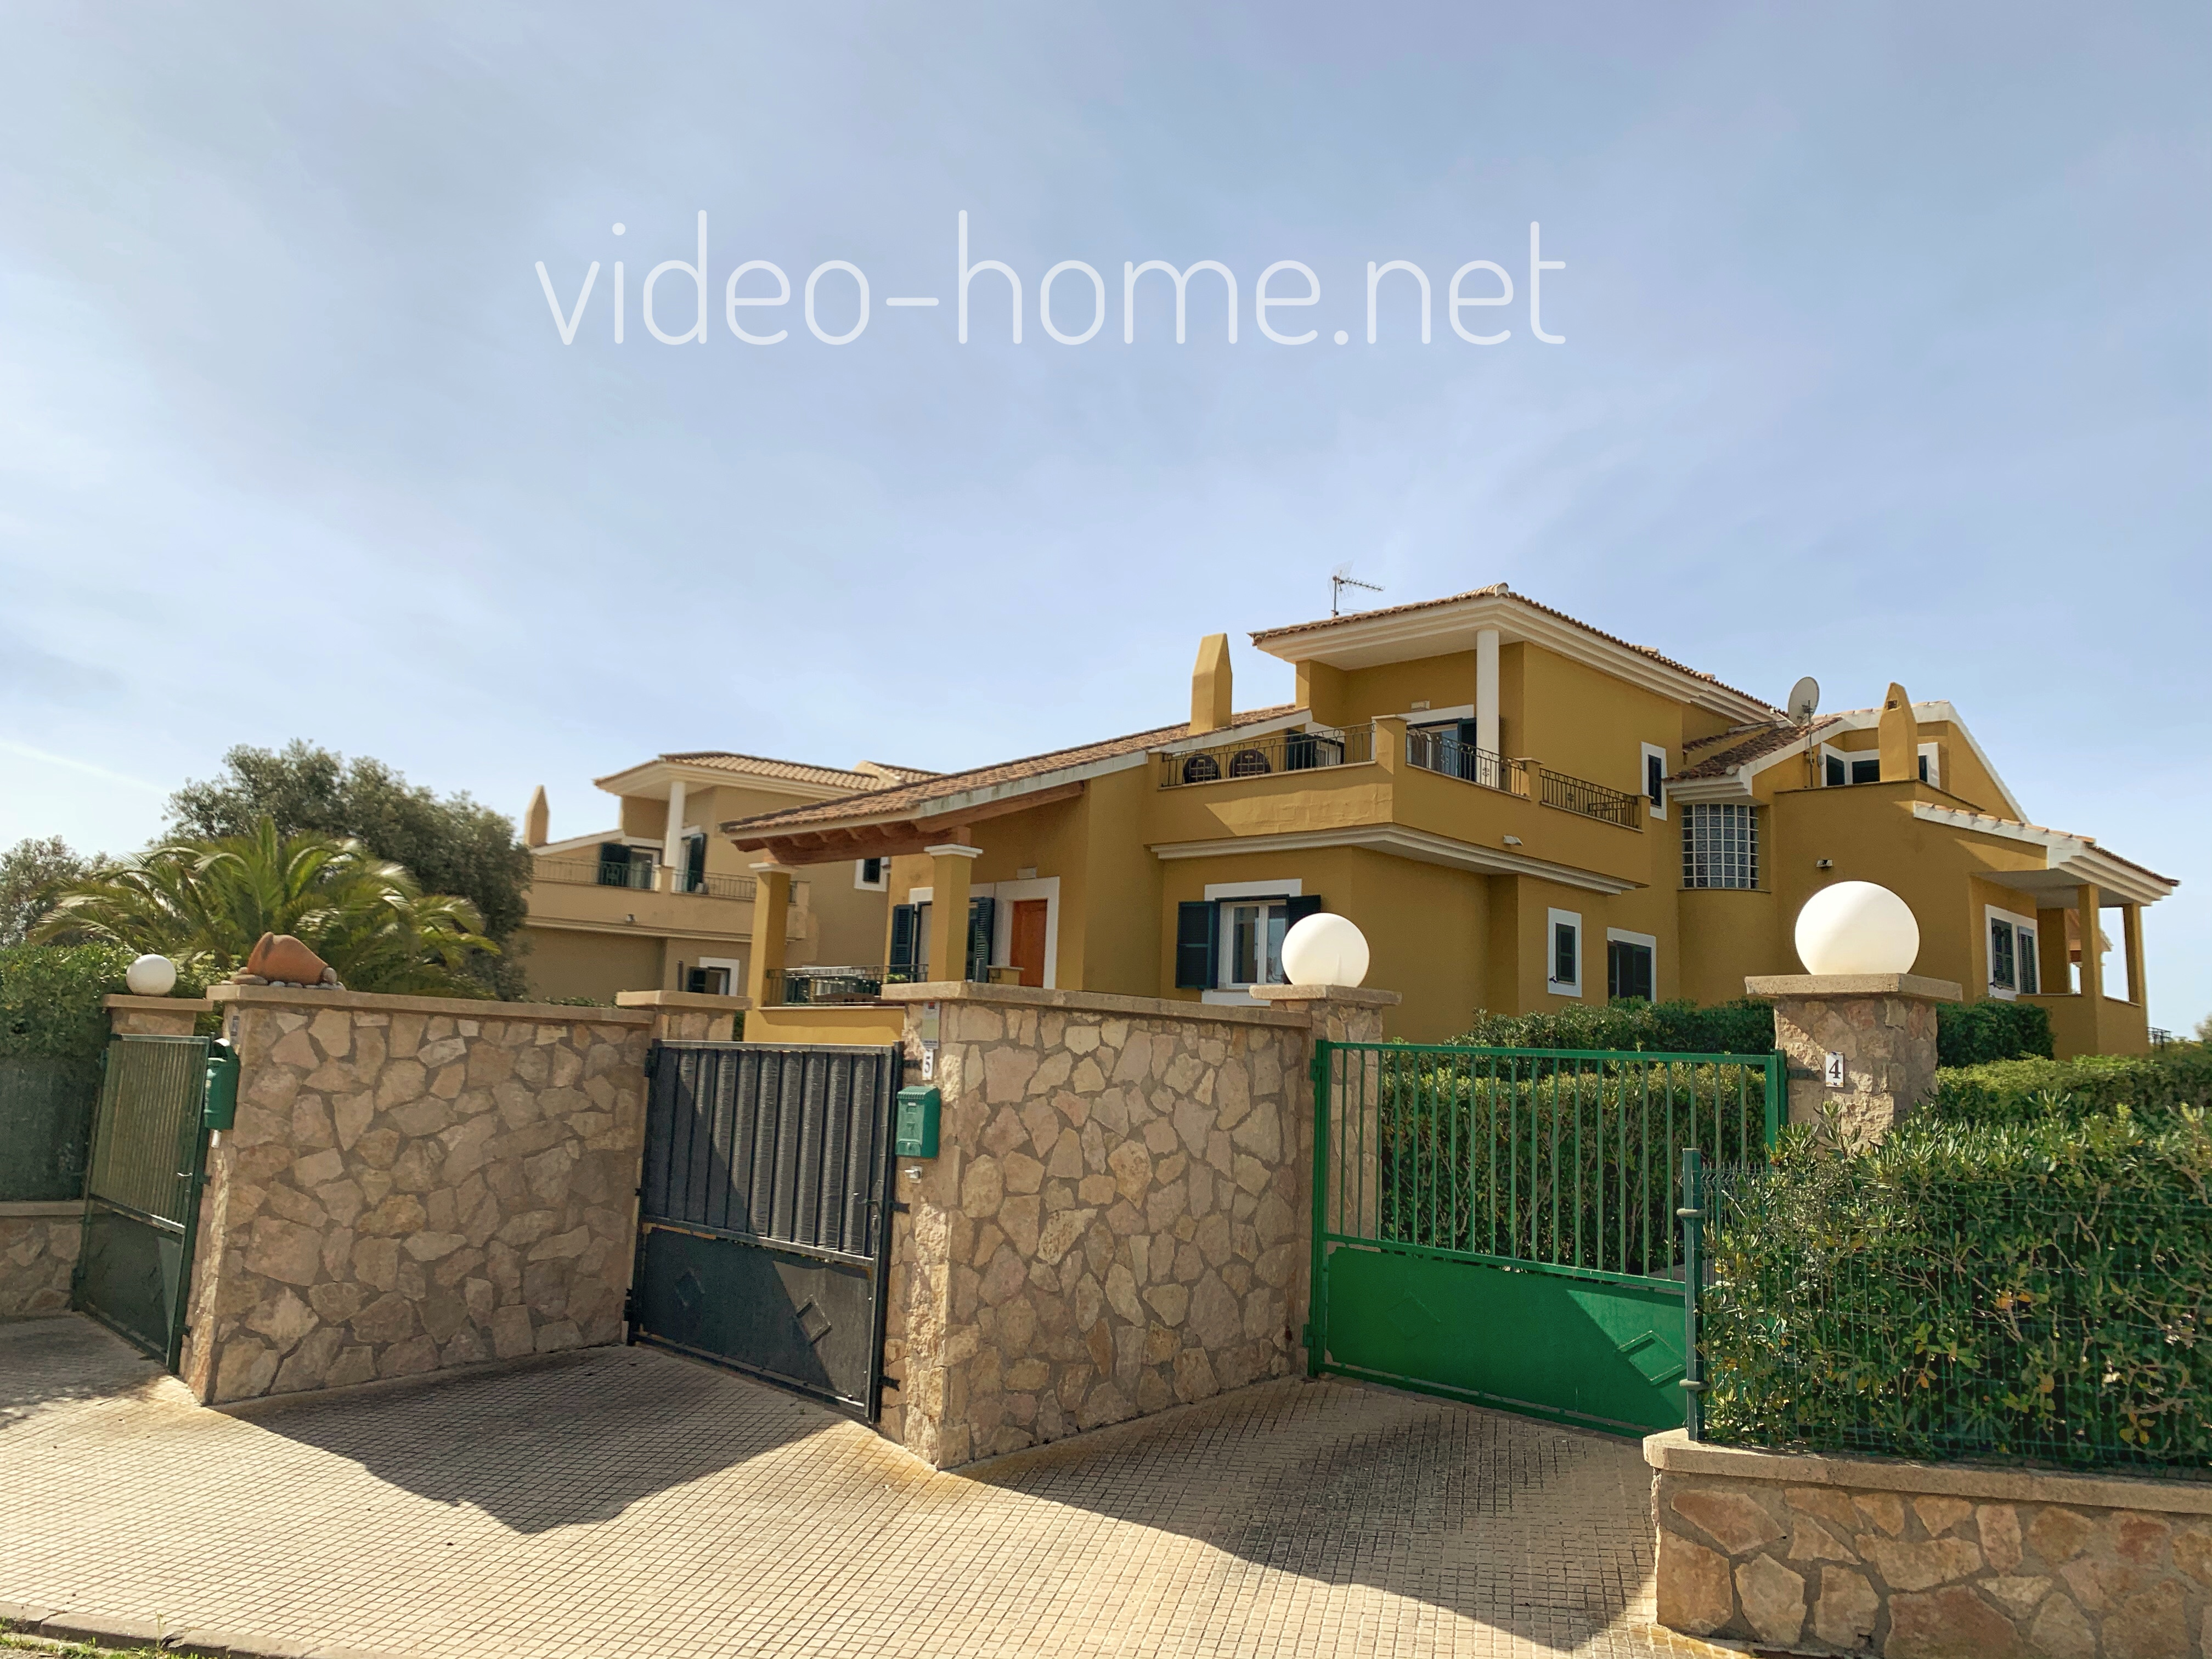 Schönes Haus mit Garten in der Nähe des Meeres in Calas de Mallorca